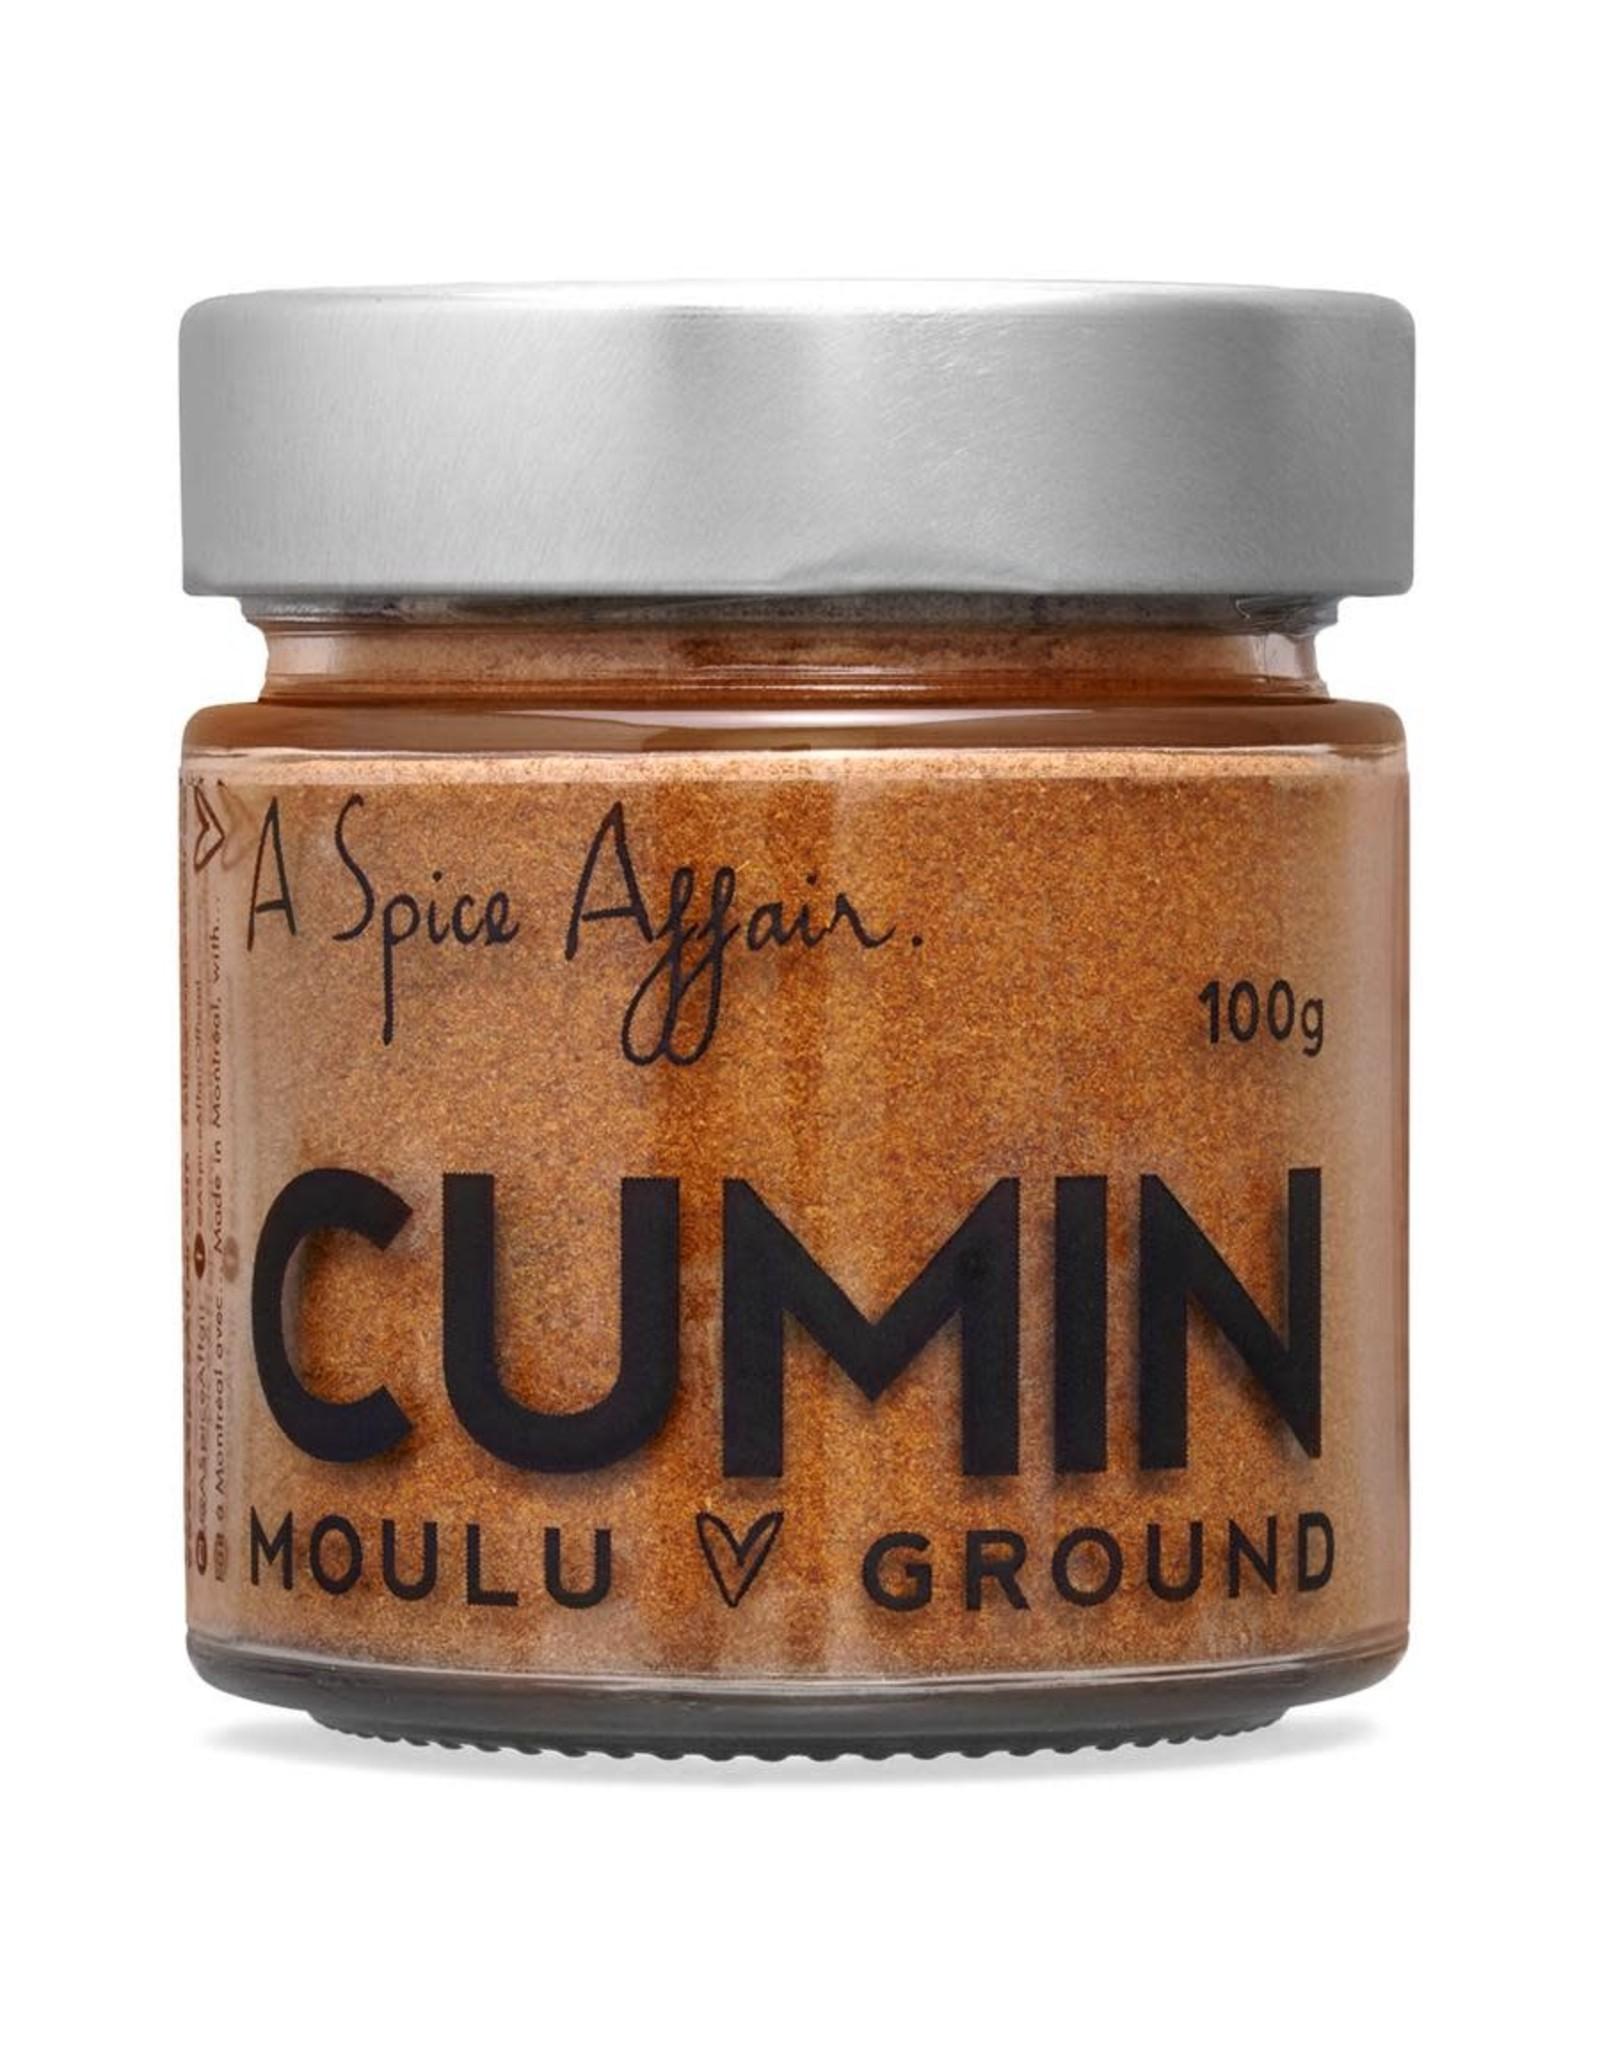 A Spice Affair Cumin Ground